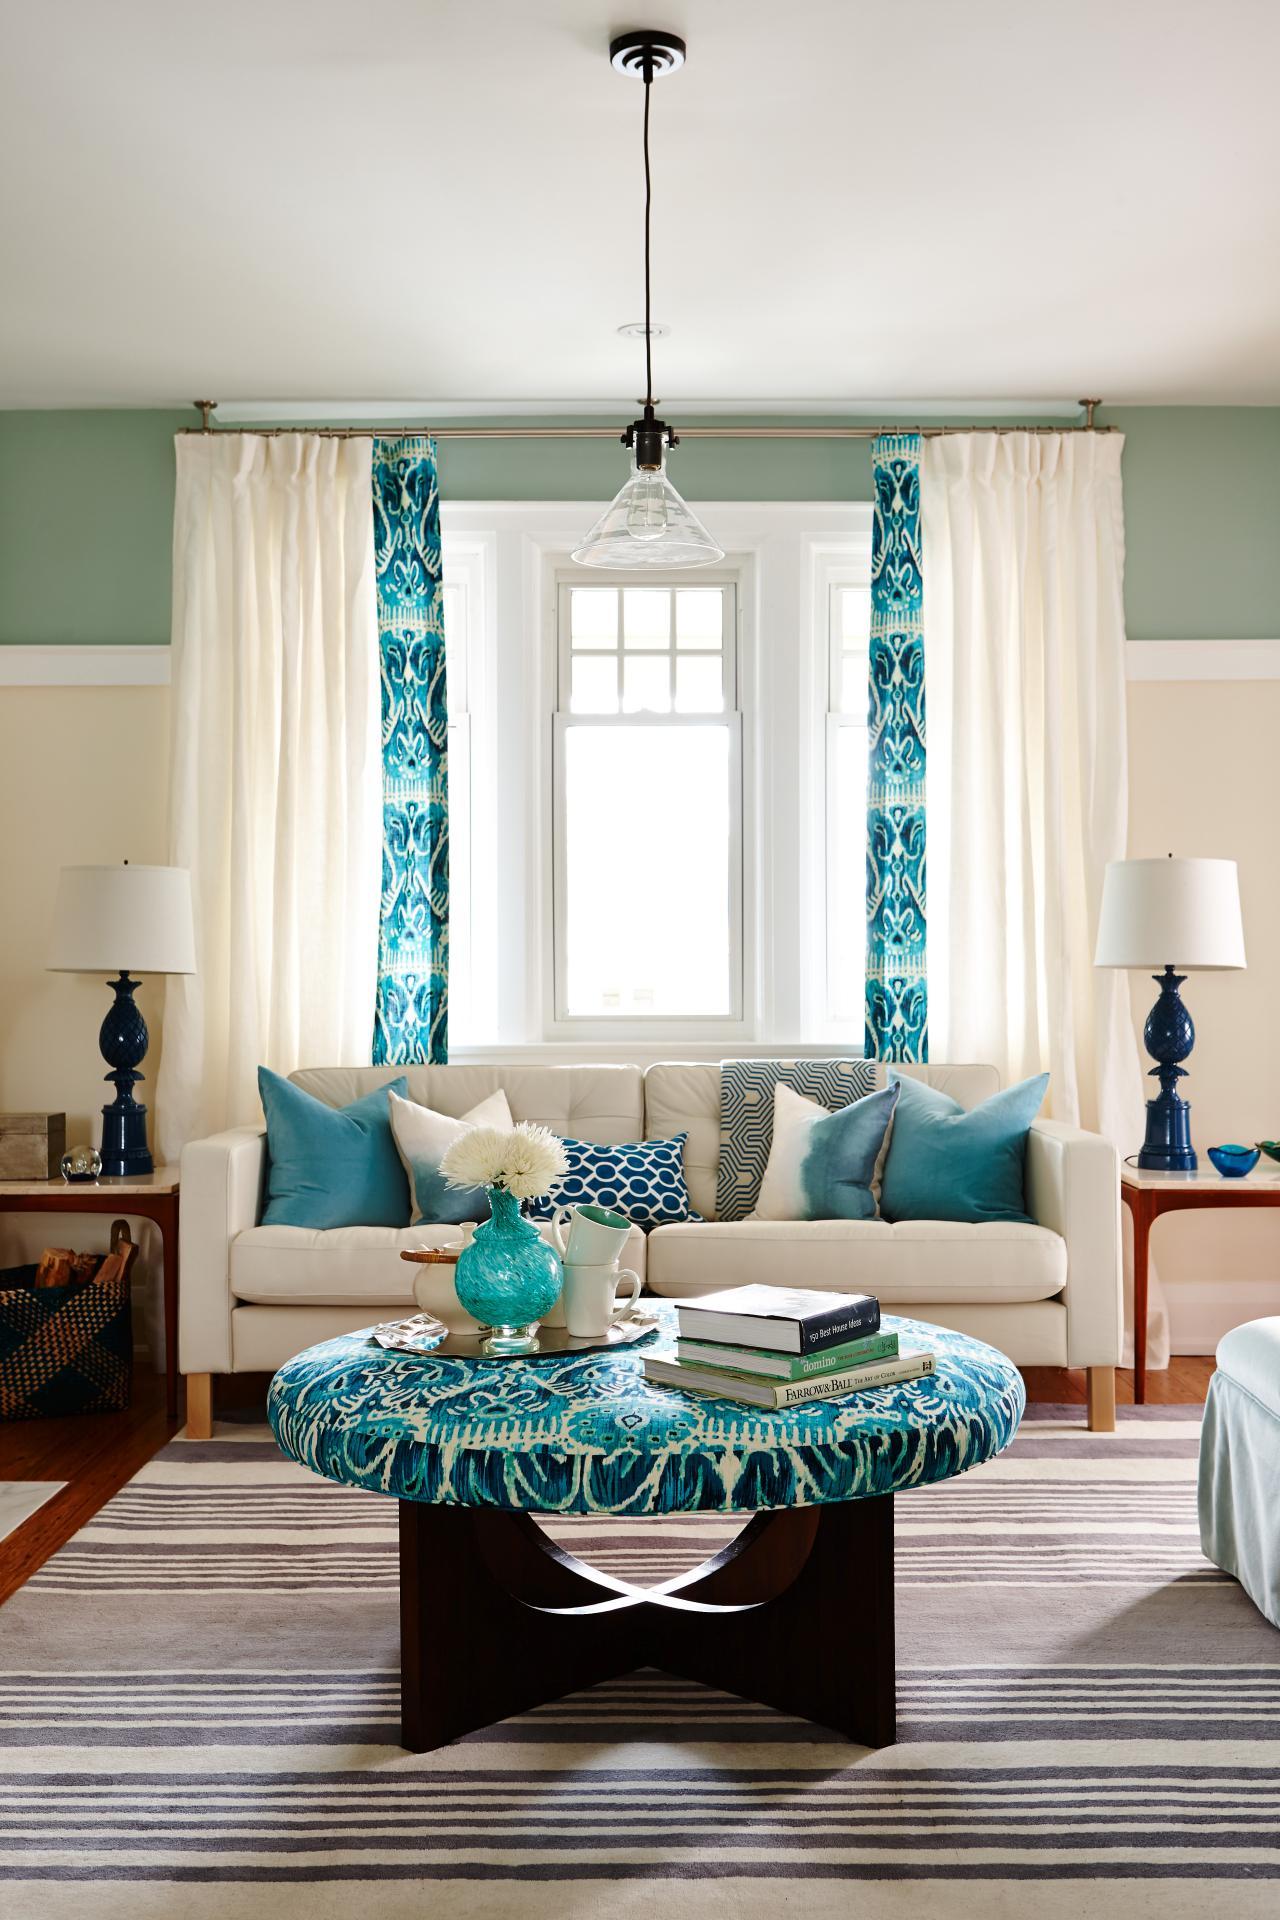 Light and Bright Window Treatments | HGTV\'s Decorating & Design Blog ...